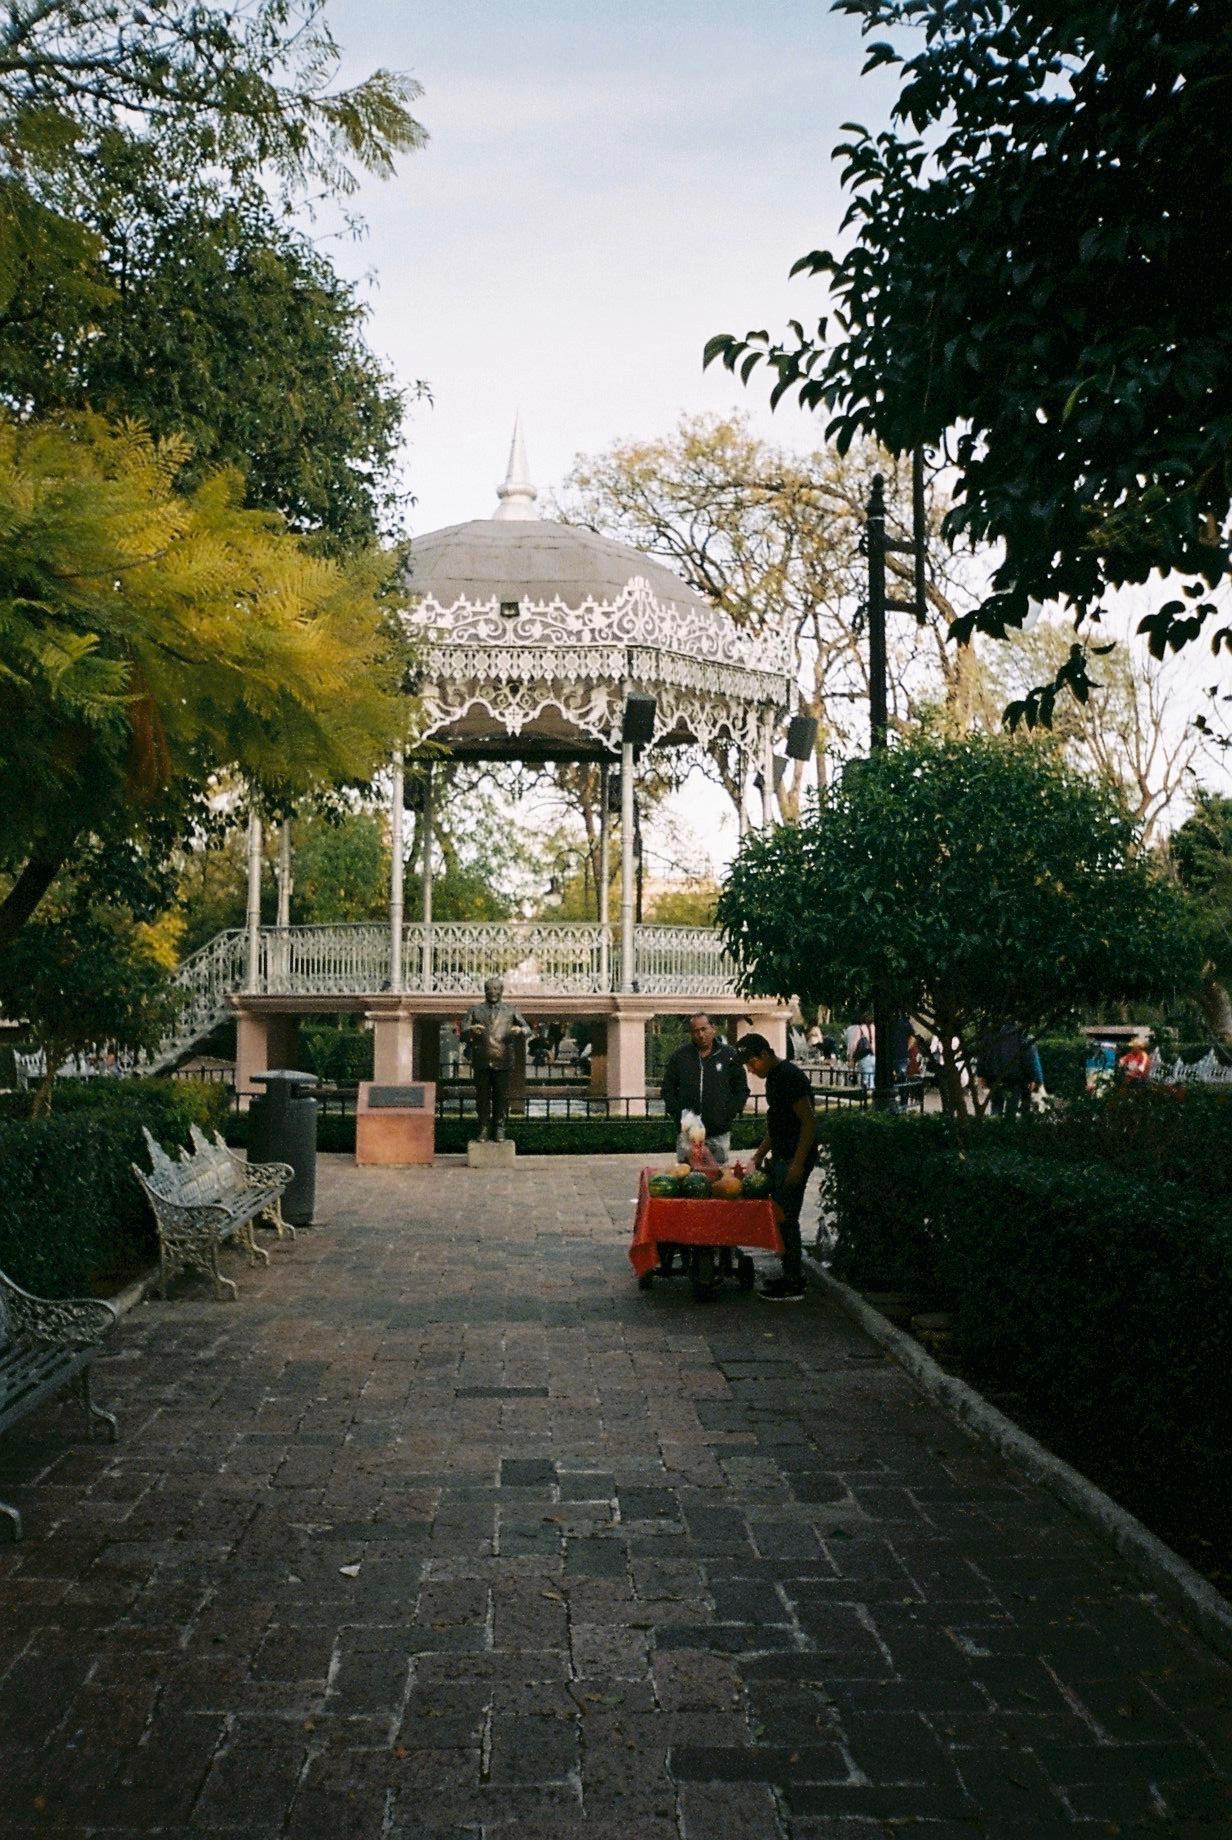 Aguascalientes 01-2020 - 5 of 24